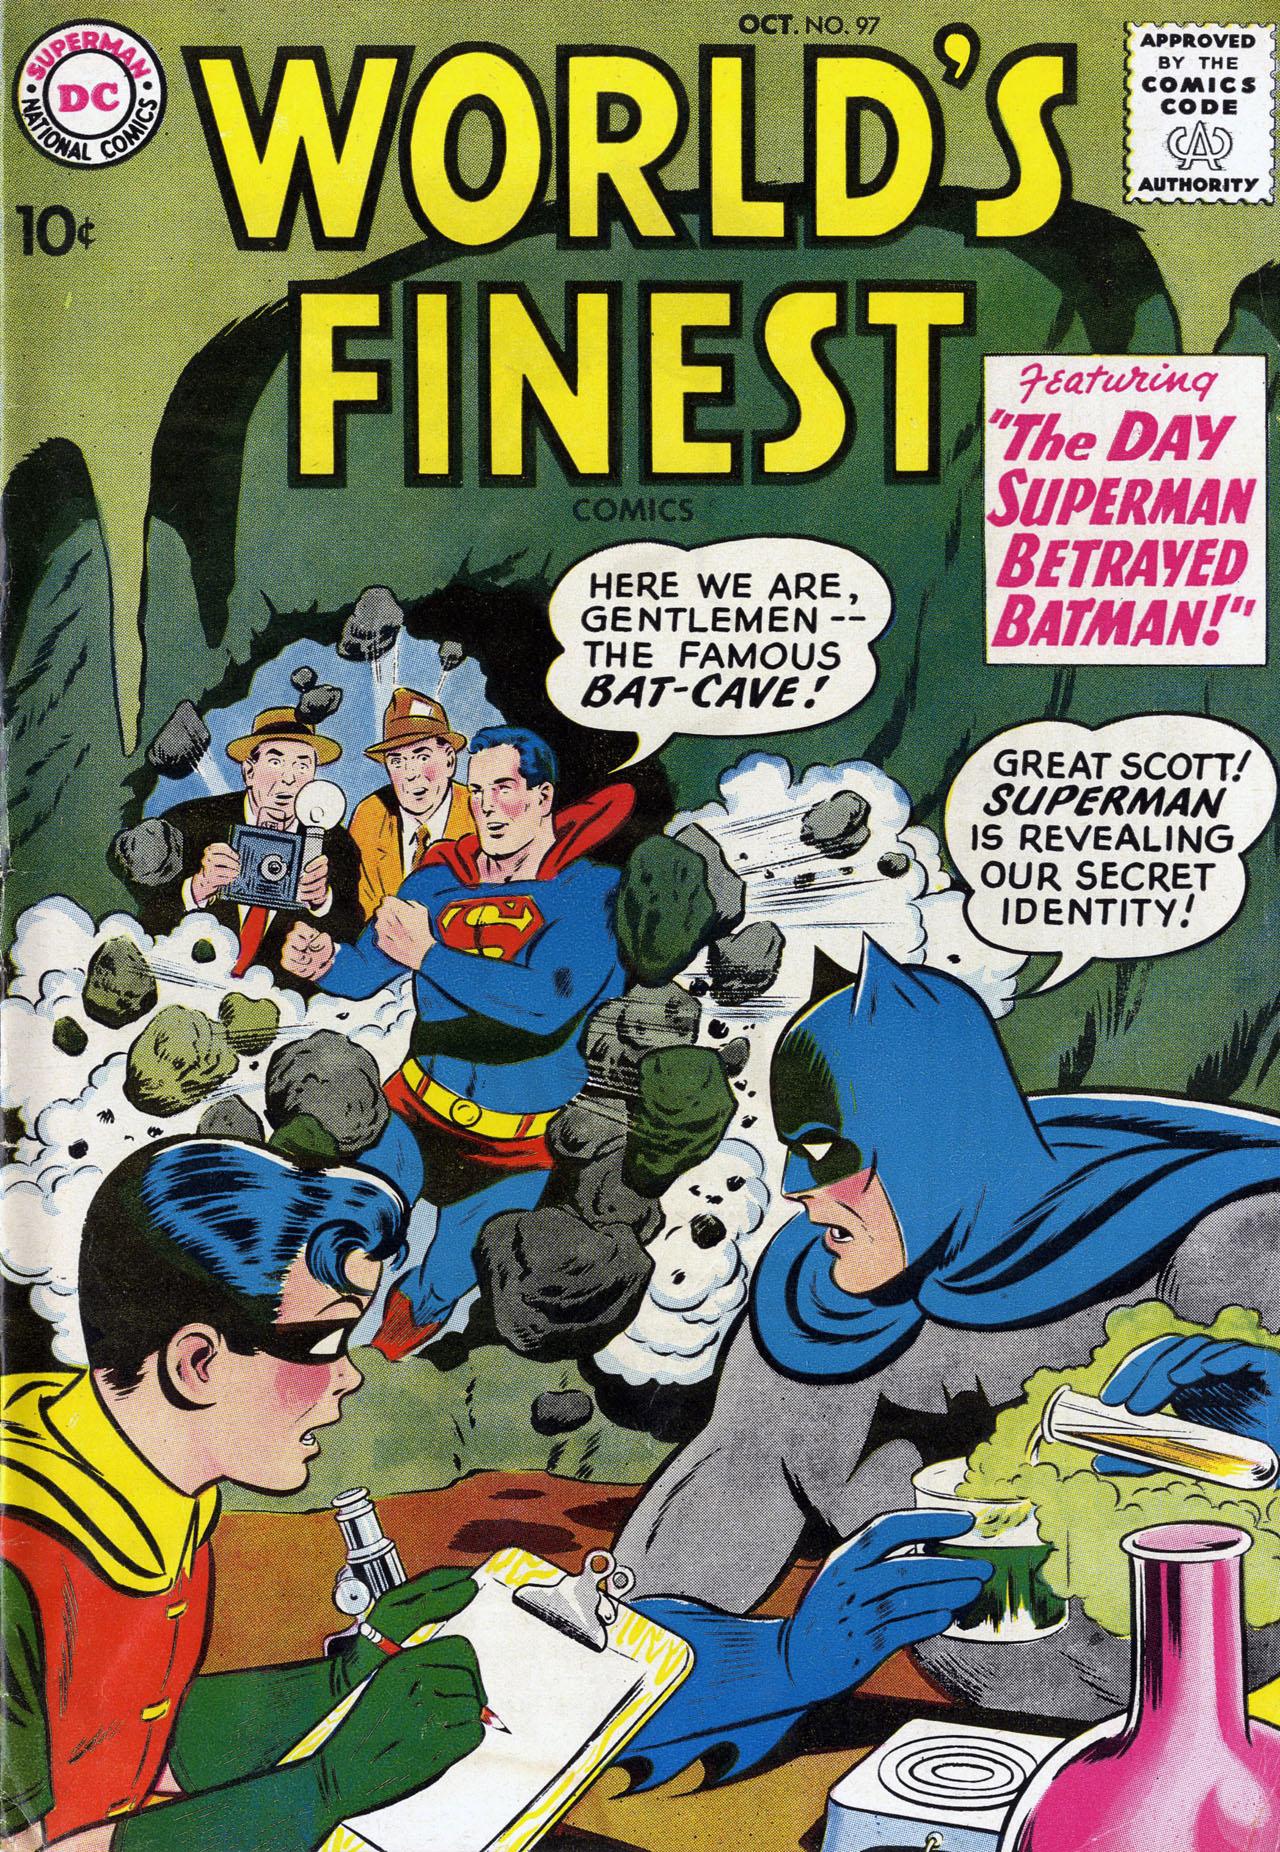 World's Finest Vol 1 97